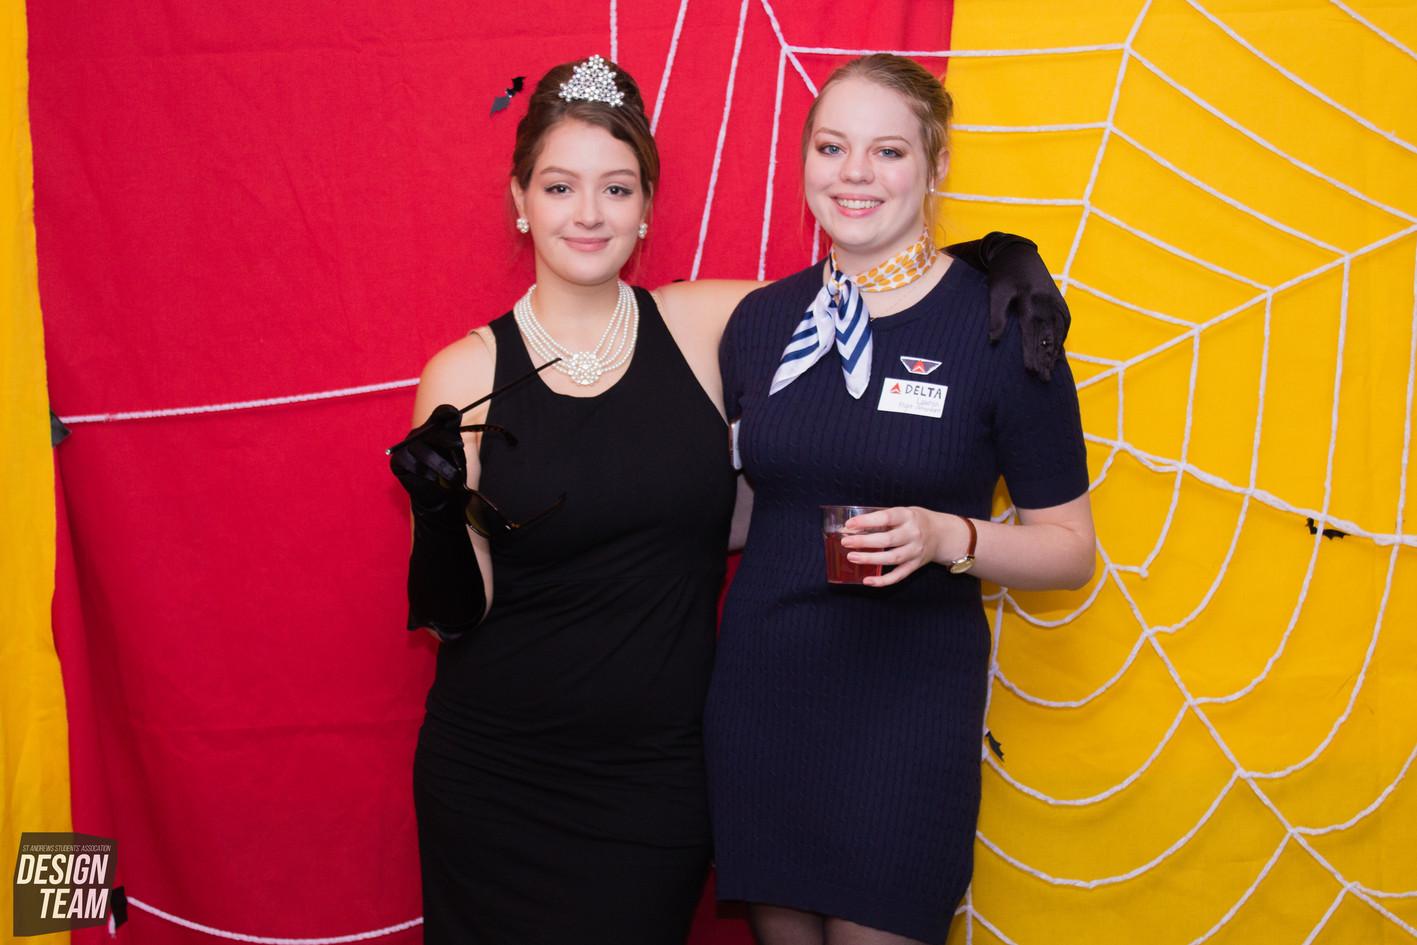 Halloween Photobooth by Erika Gravina and Rebekka Uhl